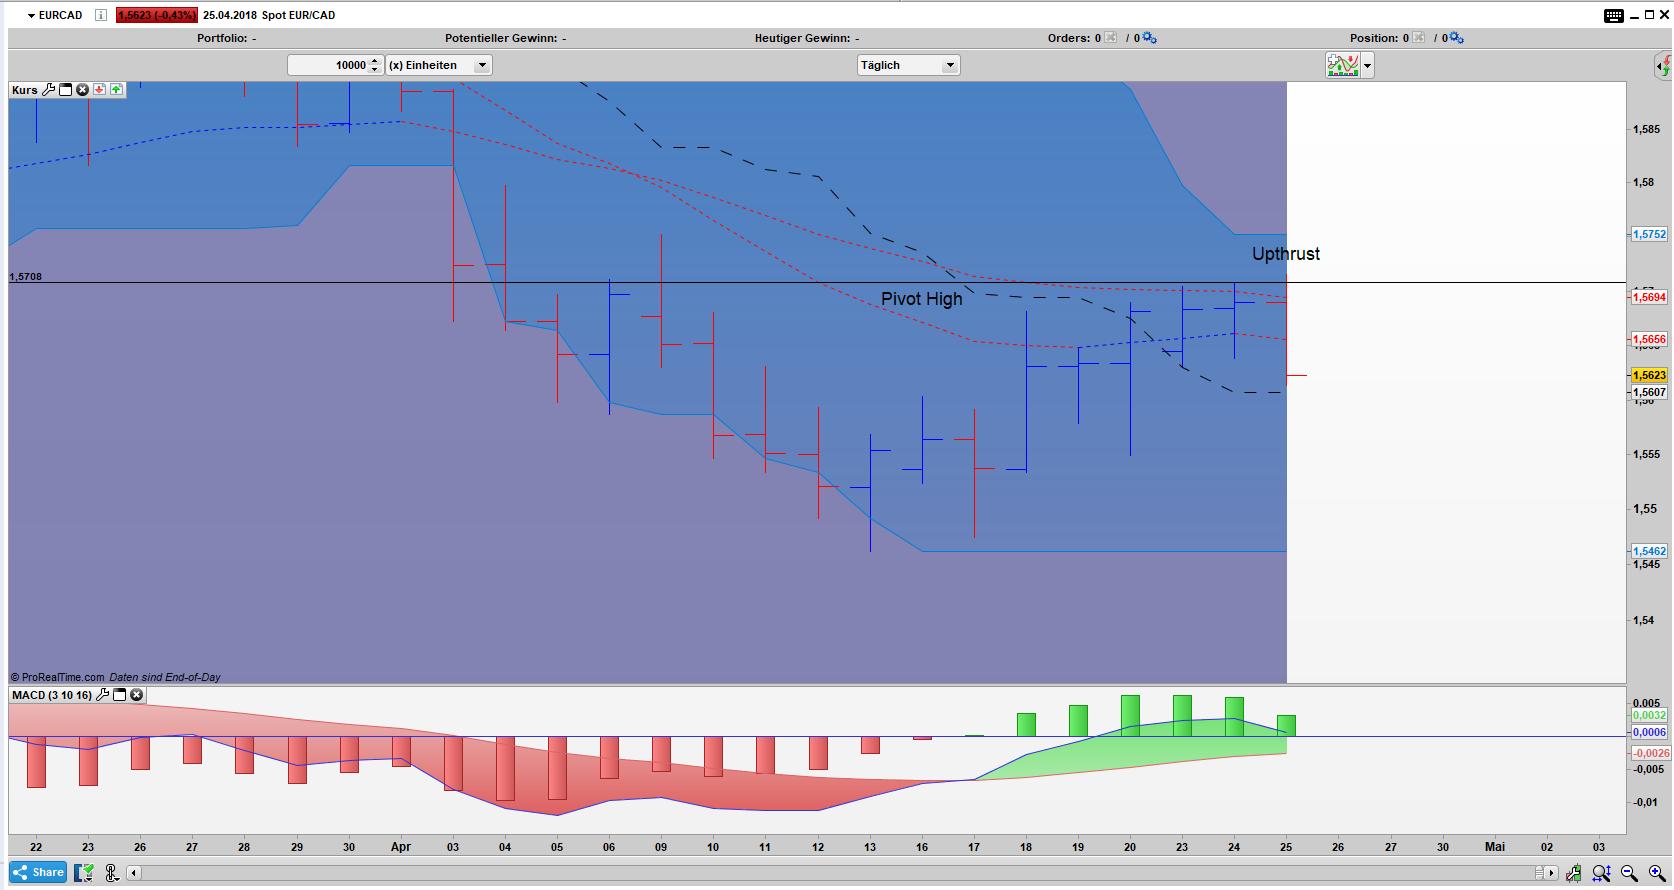 EUR/CAD Bar Tages Chart: Umkehrstab Upthrust Pattern aktiv